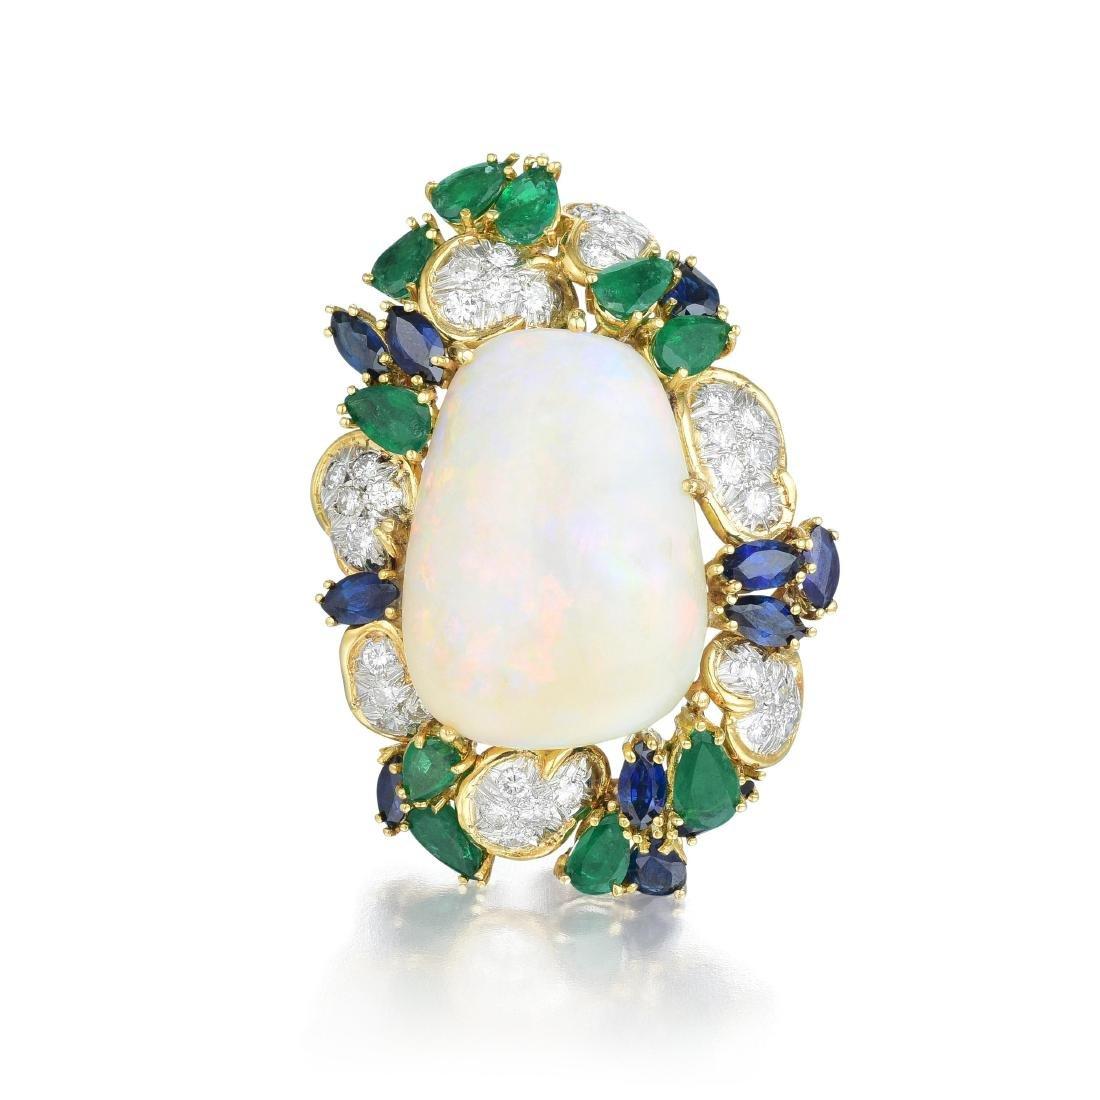 Henry Dunay Opal, Diamond, and Gemstone Brooch